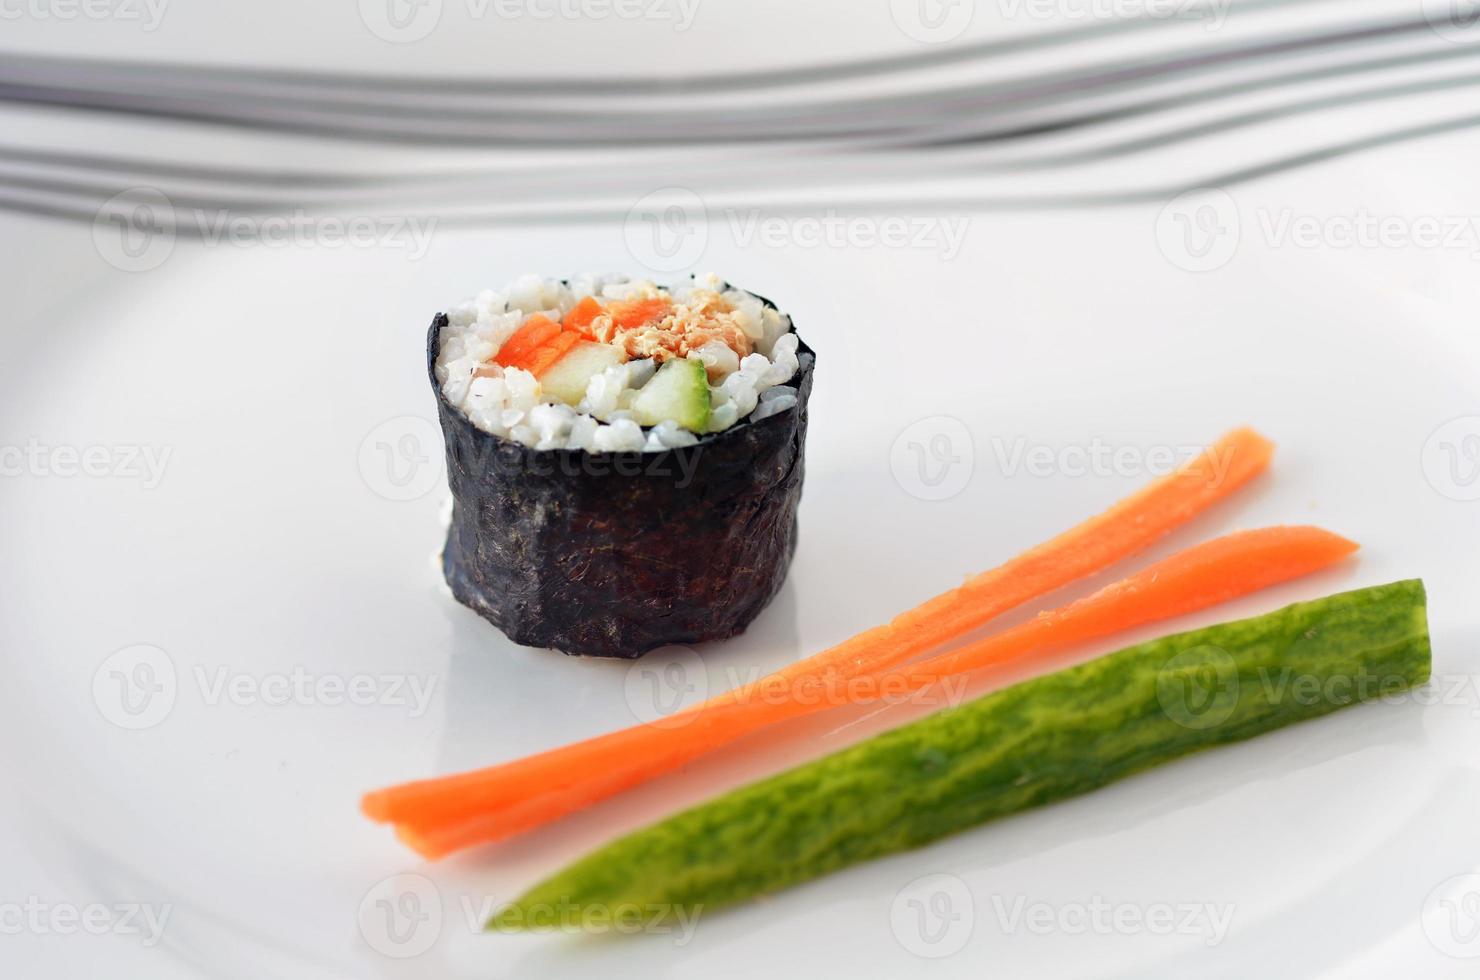 en makizushi sushi färsk makirulle - horisontal foto